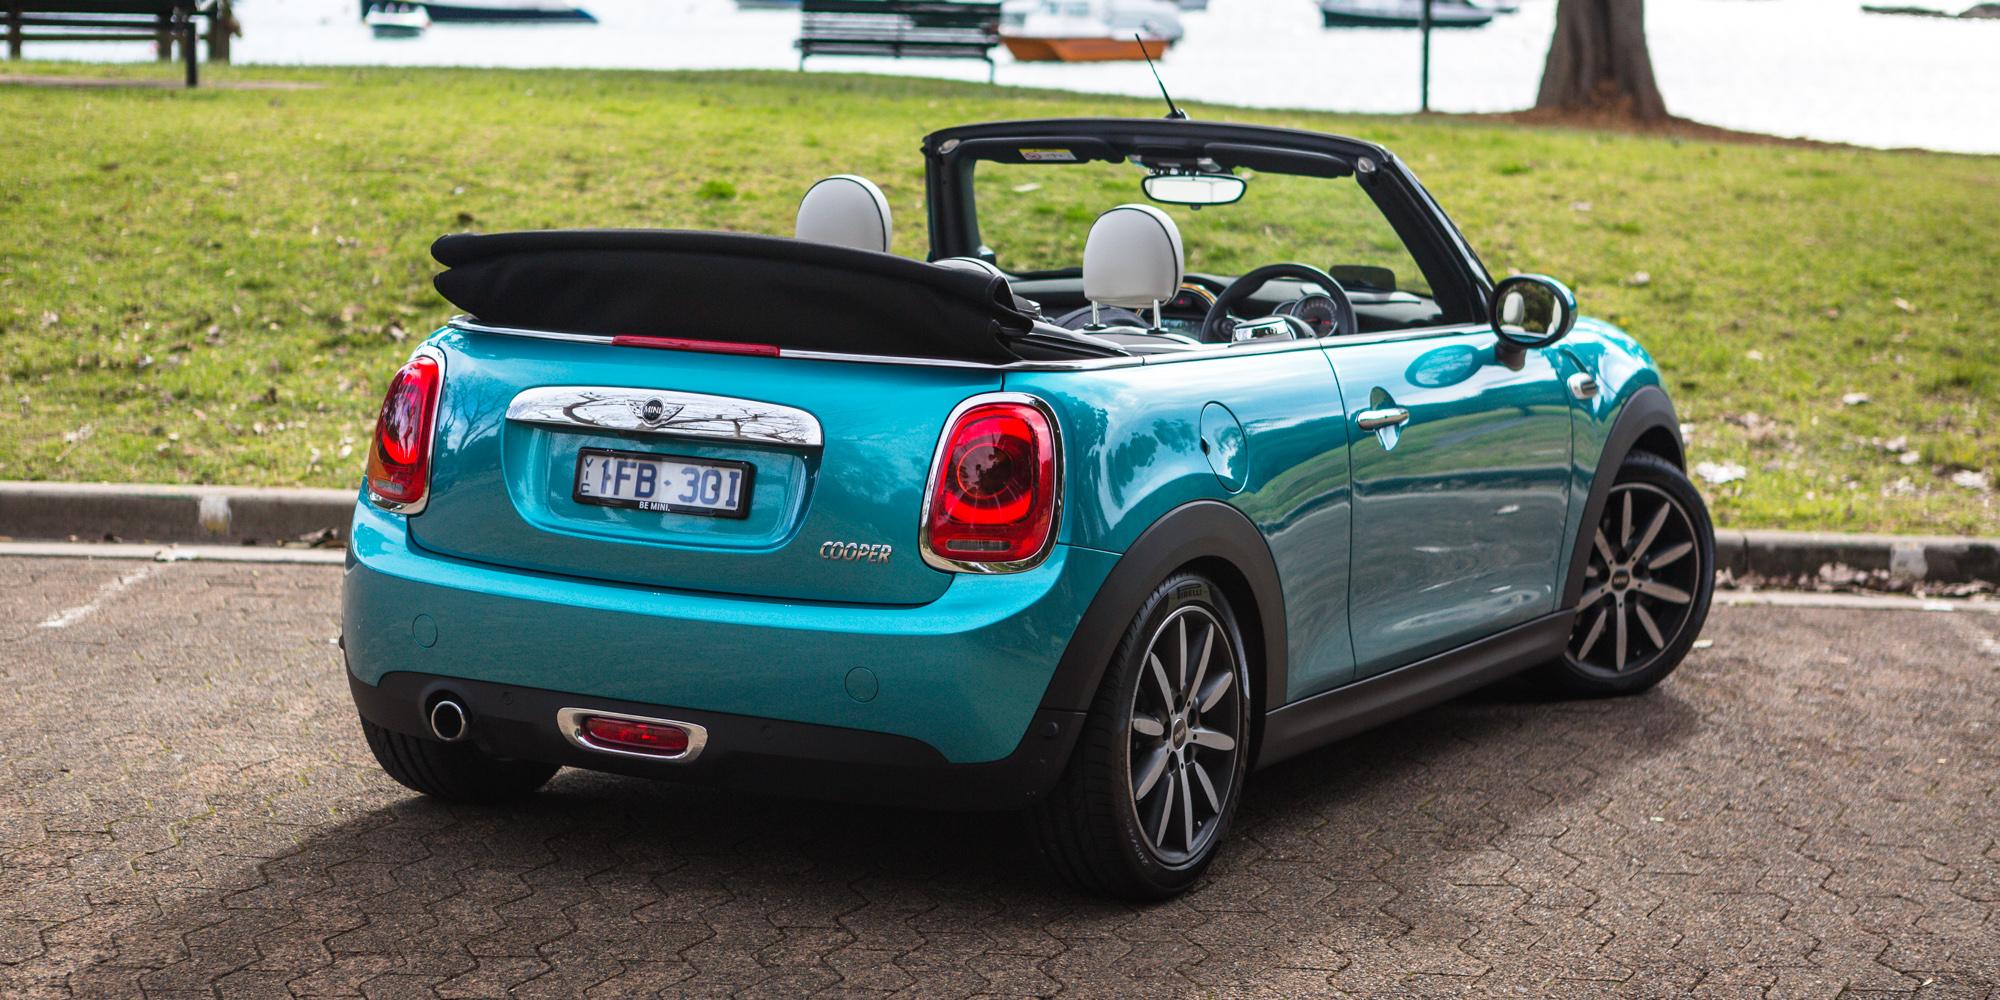 Mini Cooper Sports Car Convertible